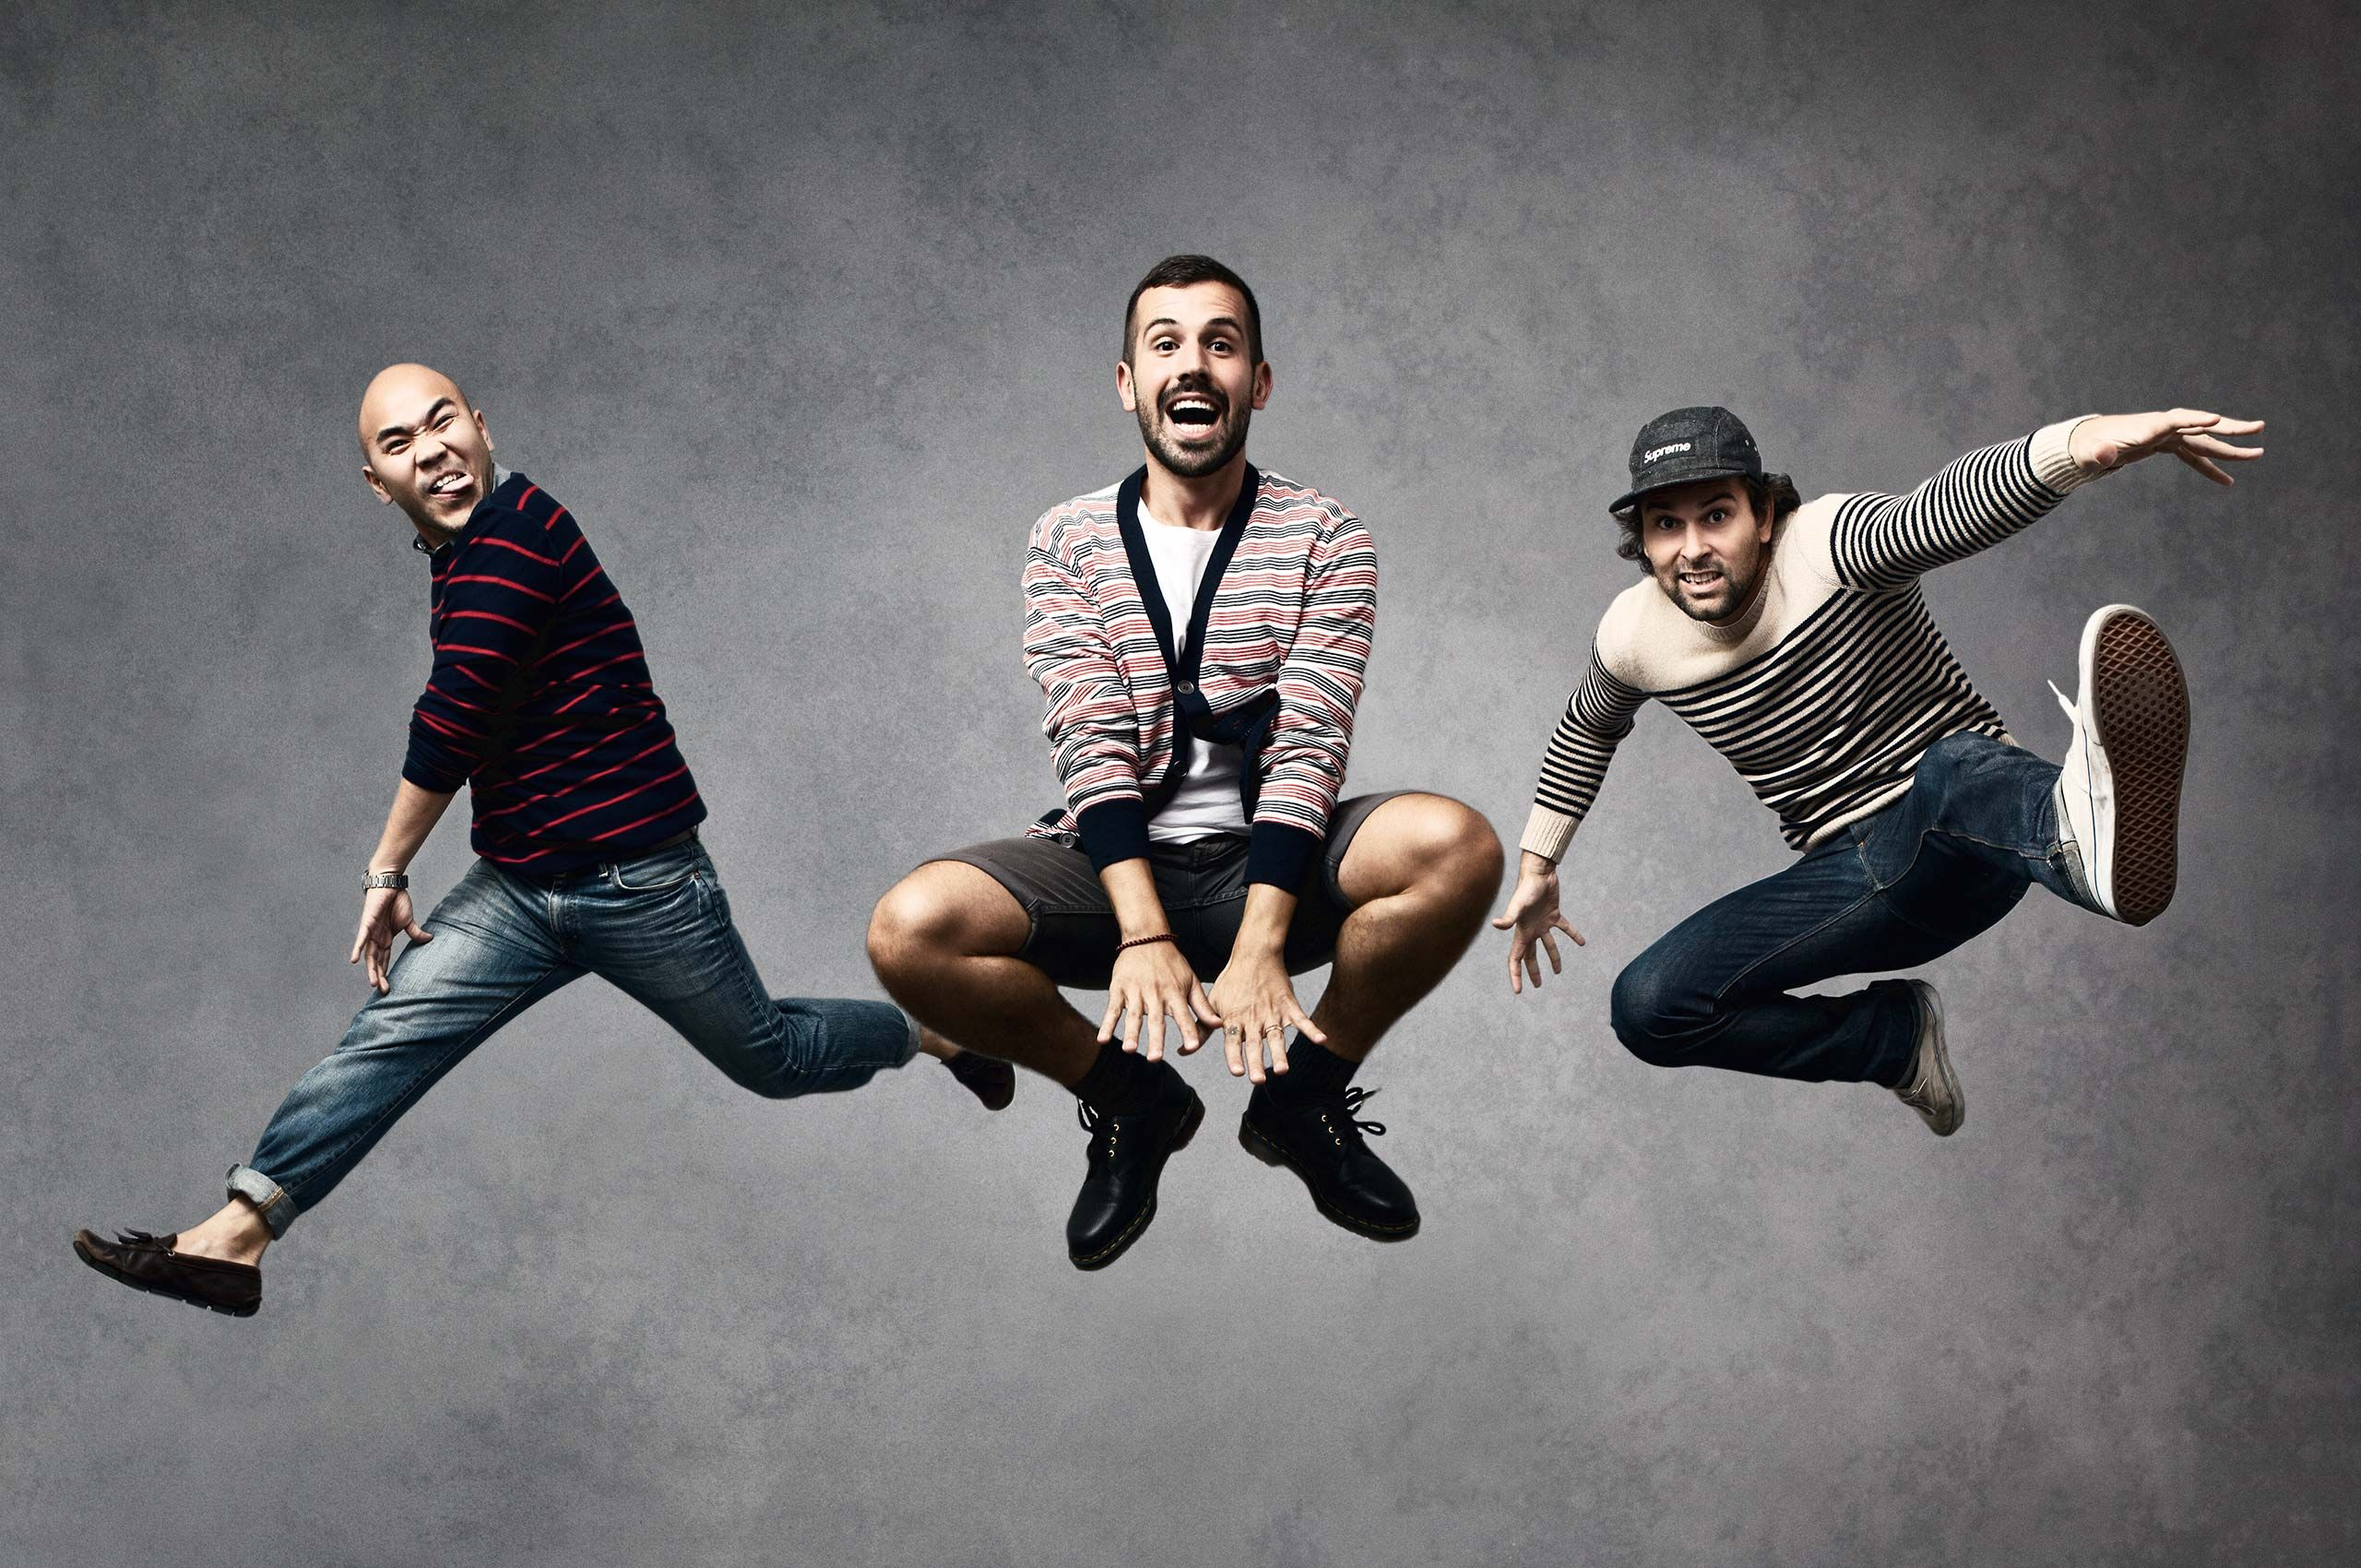 coordinated-jump-HenrikOlundPhotography.jpg